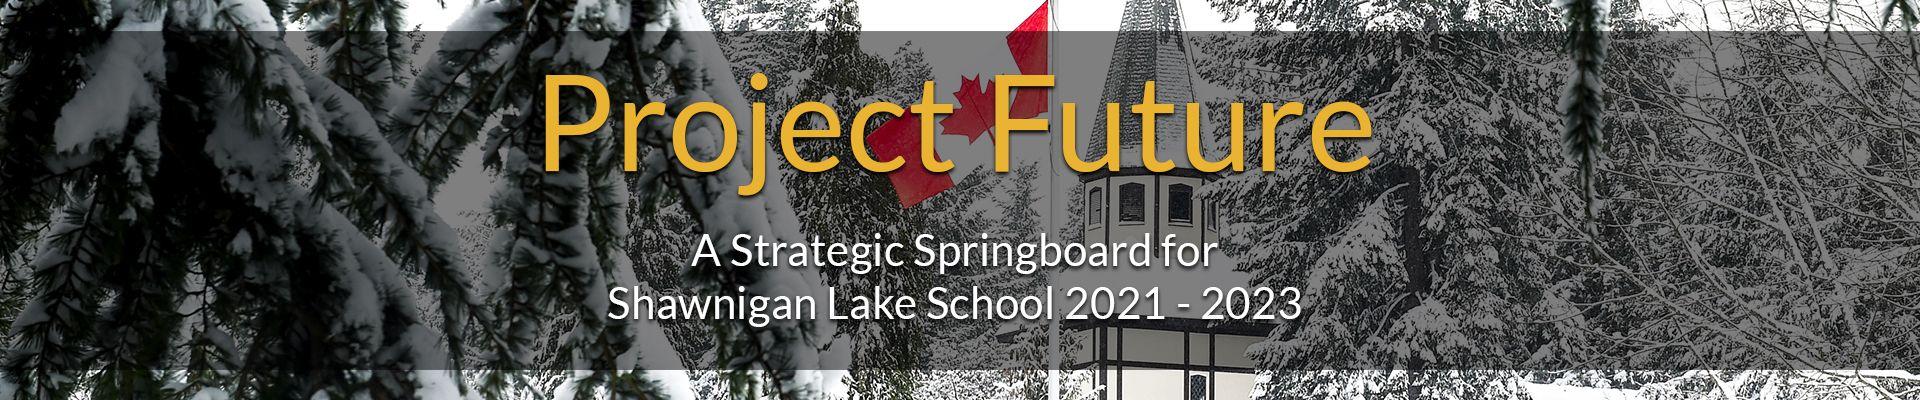 Project Future